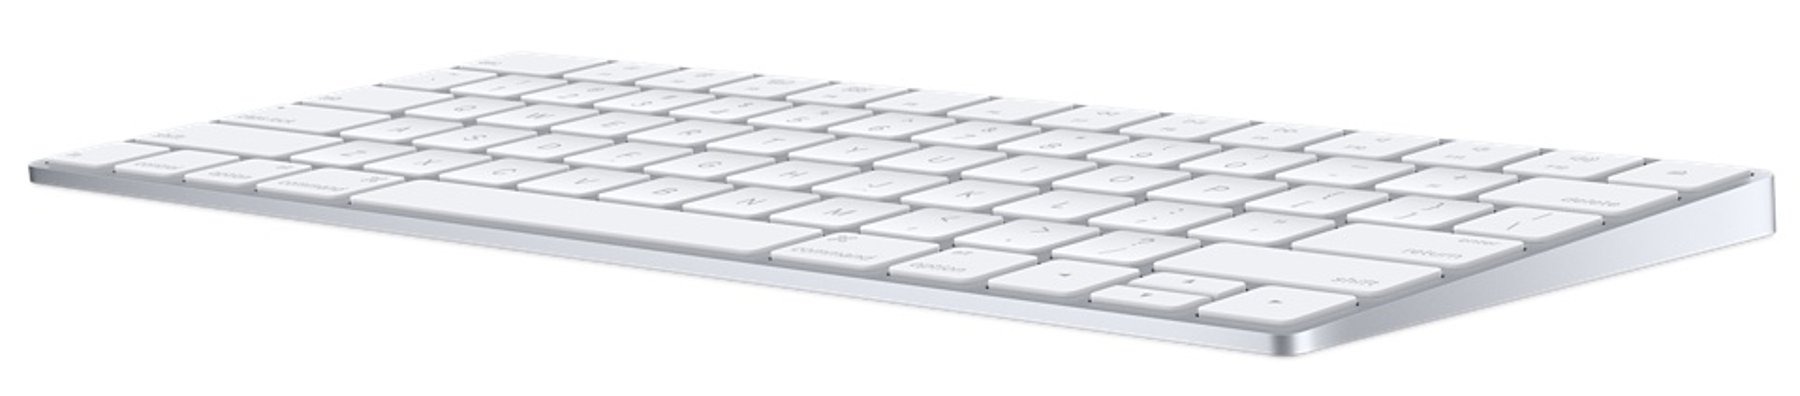 Apple Magic Keyboard Wireless Keyboard MAGIC-KEYBOARD